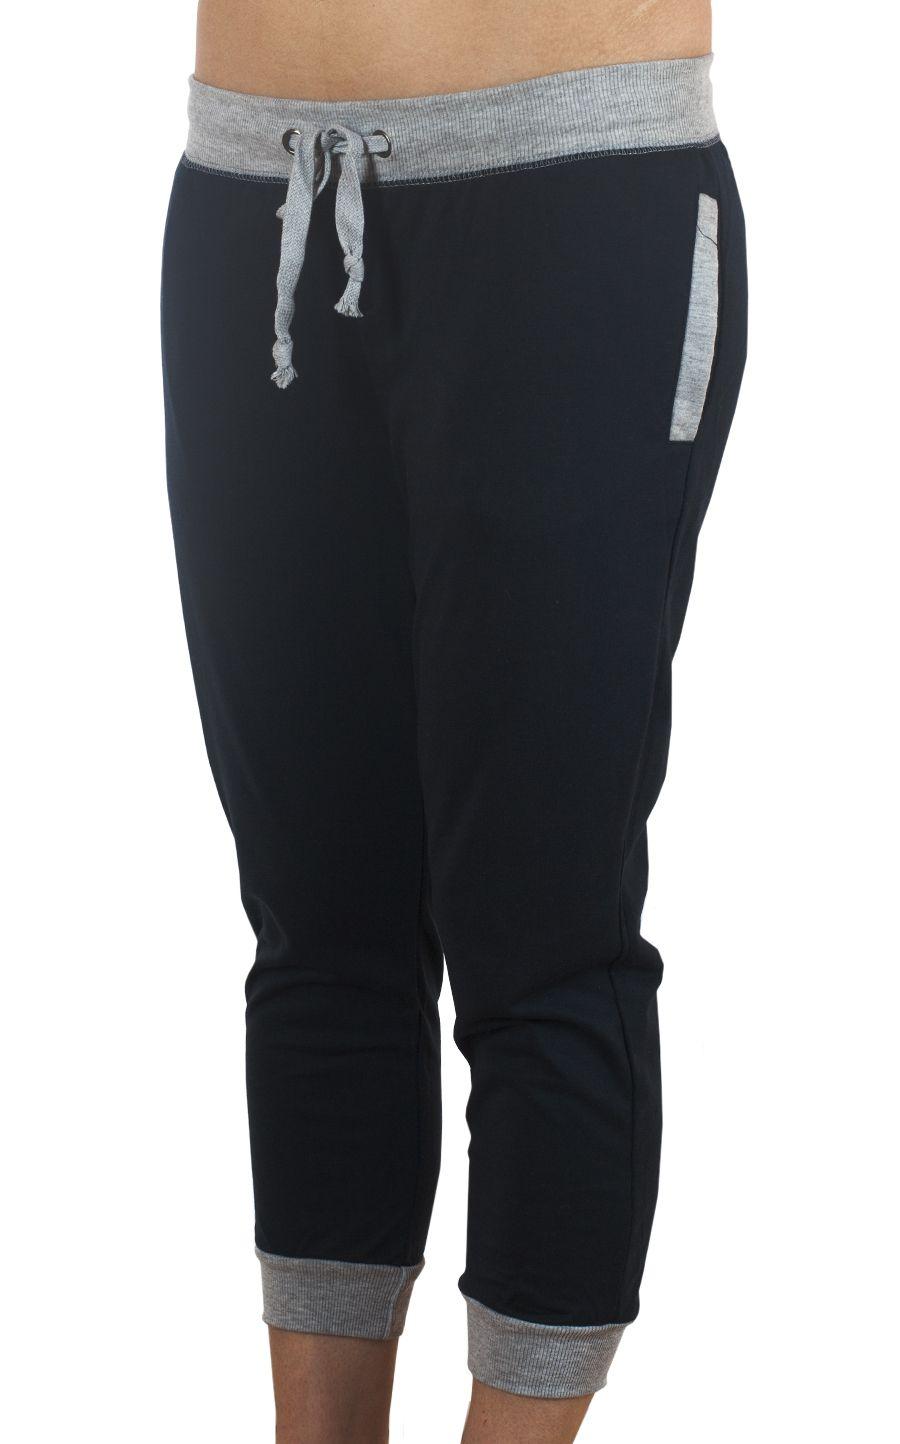 Американские брюки капри Coco Limon для фитнес-тренинга - вид спереди